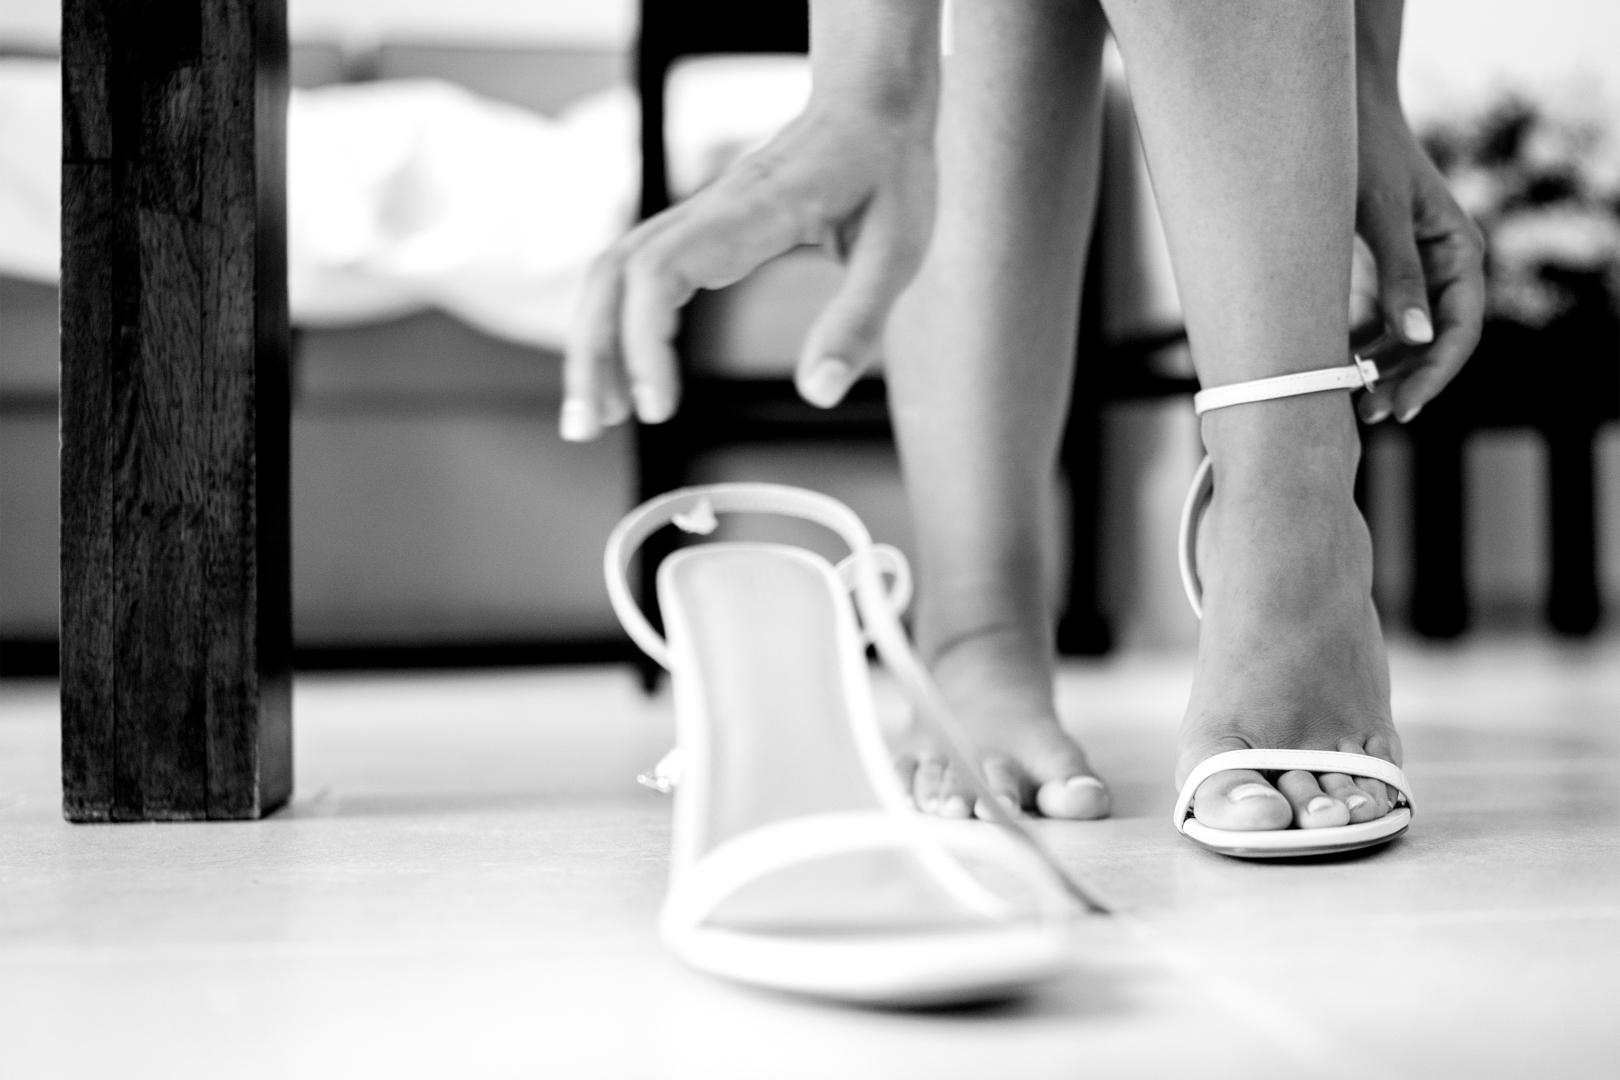 19 gianni-lepore-allaccia-scarpe-sposa